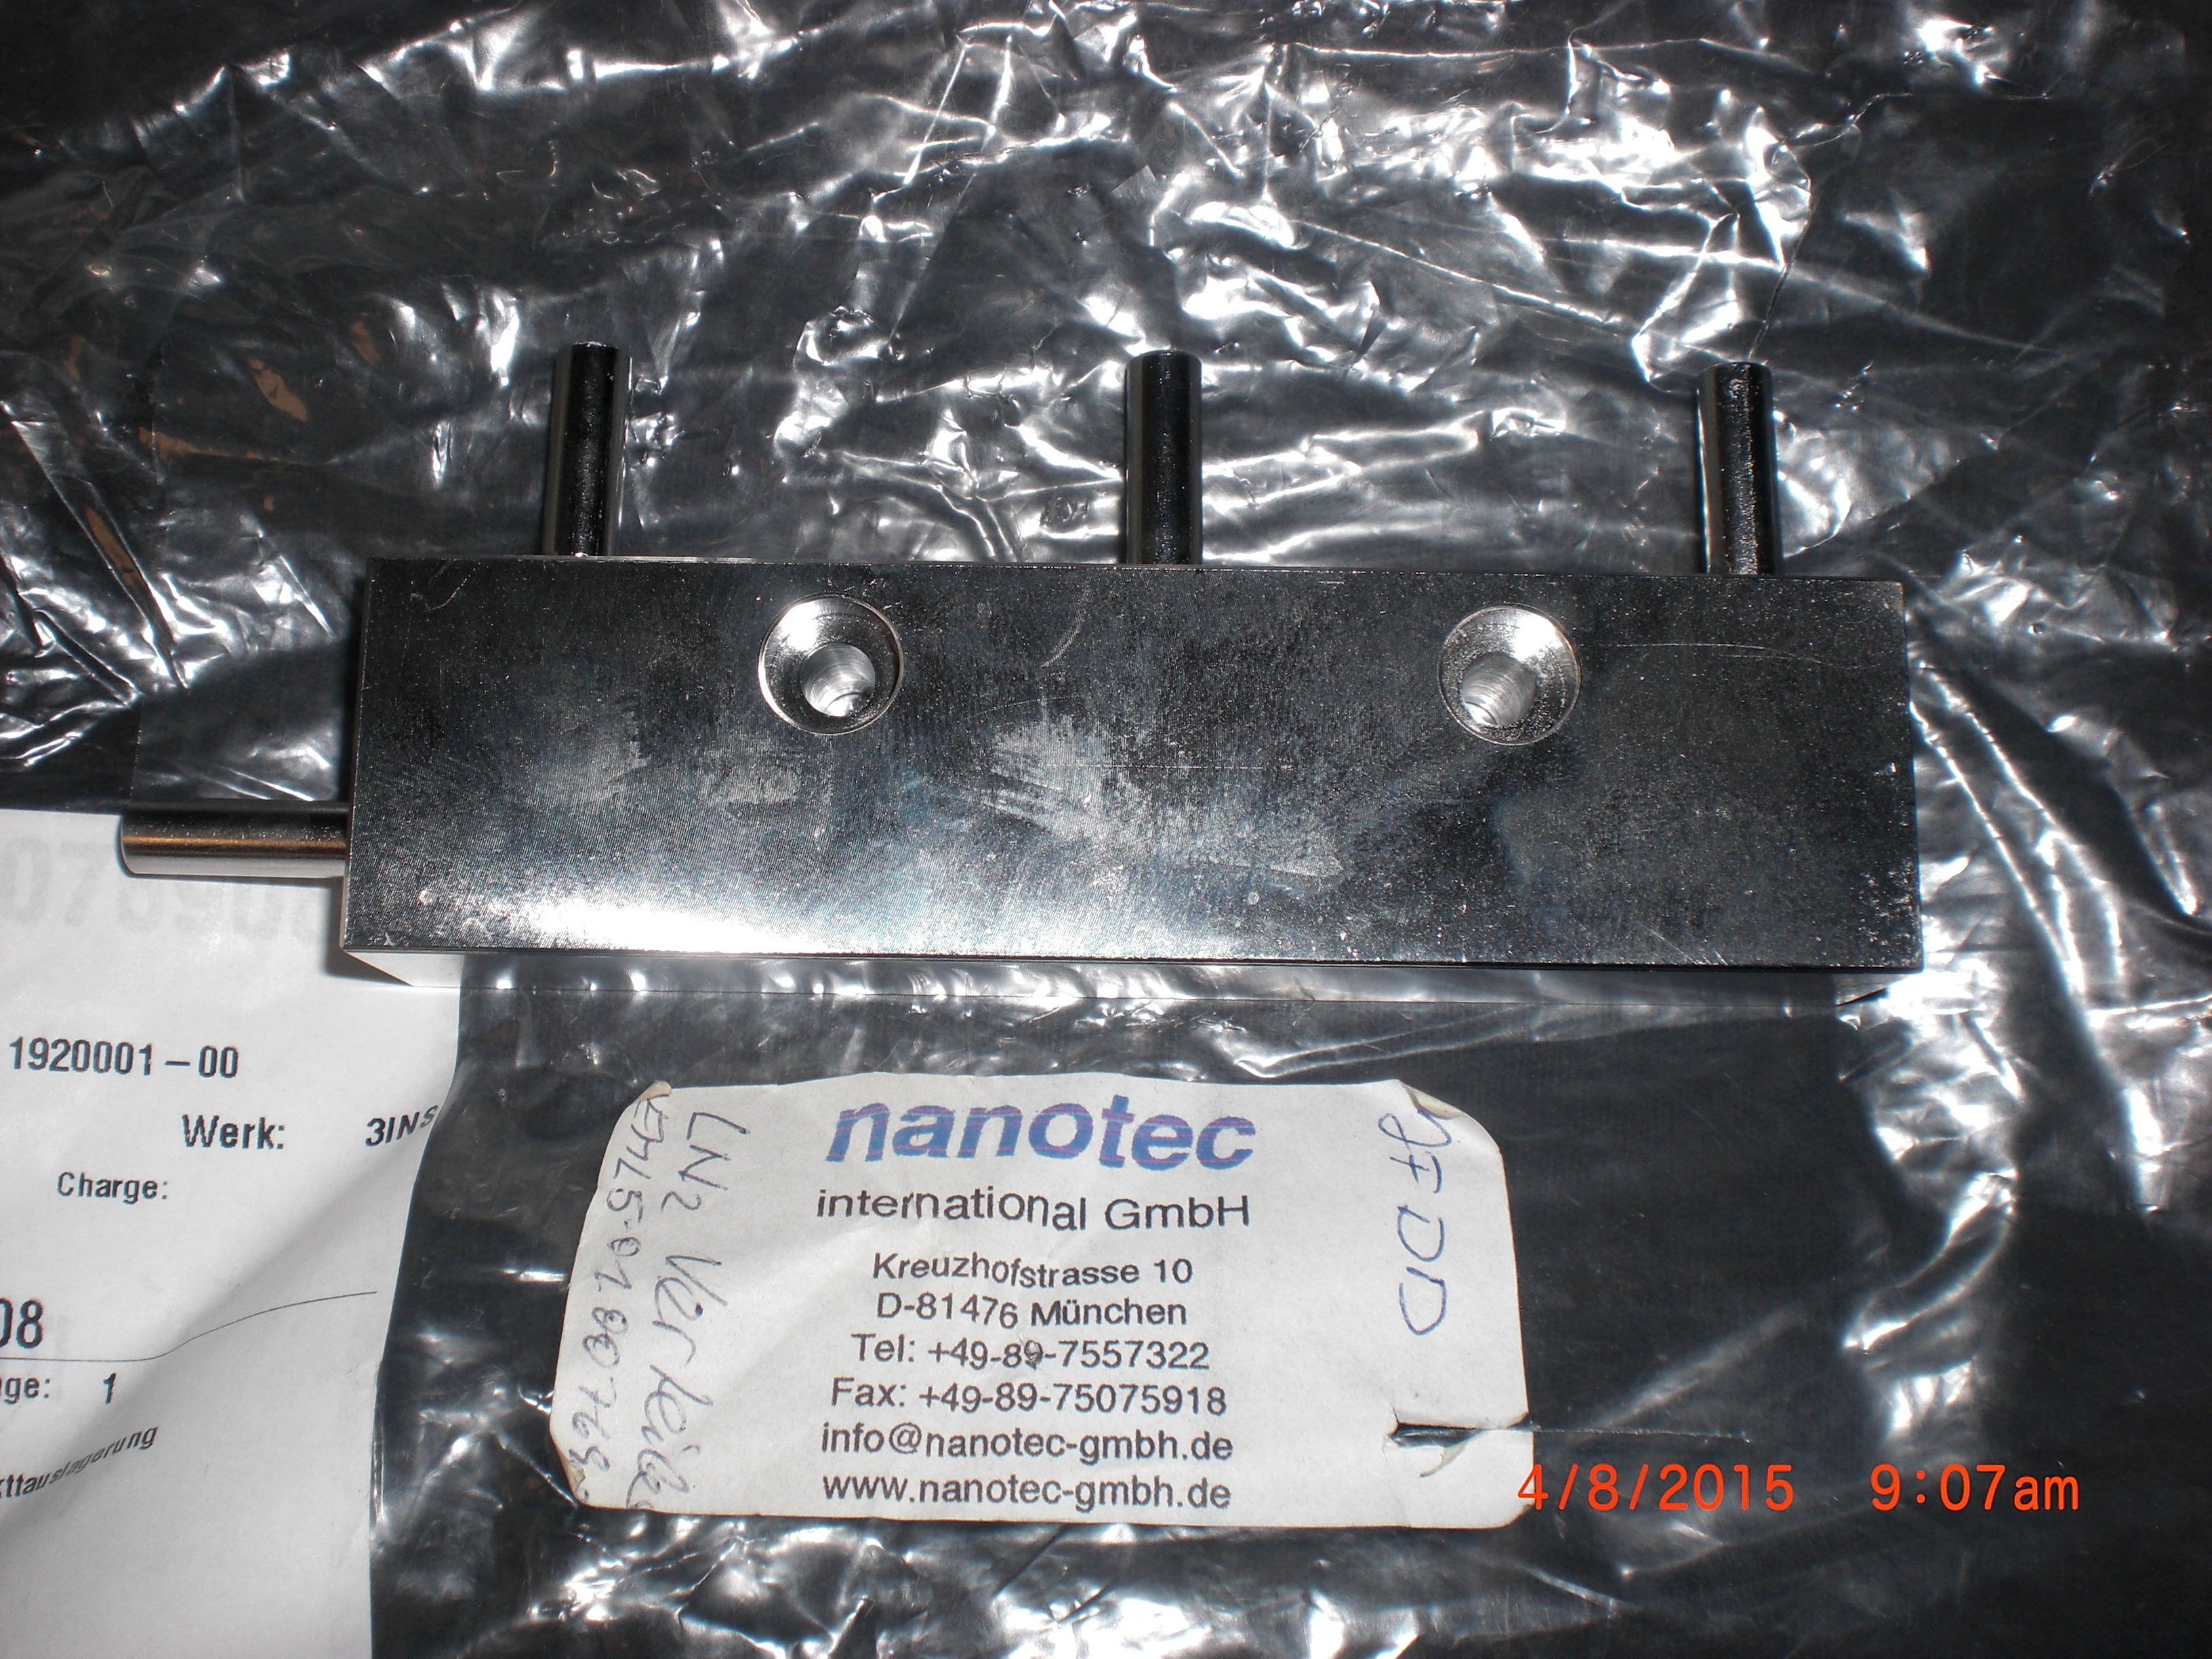 Valve LN2 /Gas Manifold Block 316L SS 3 port 1/4T nanotec MH5-1920001-00